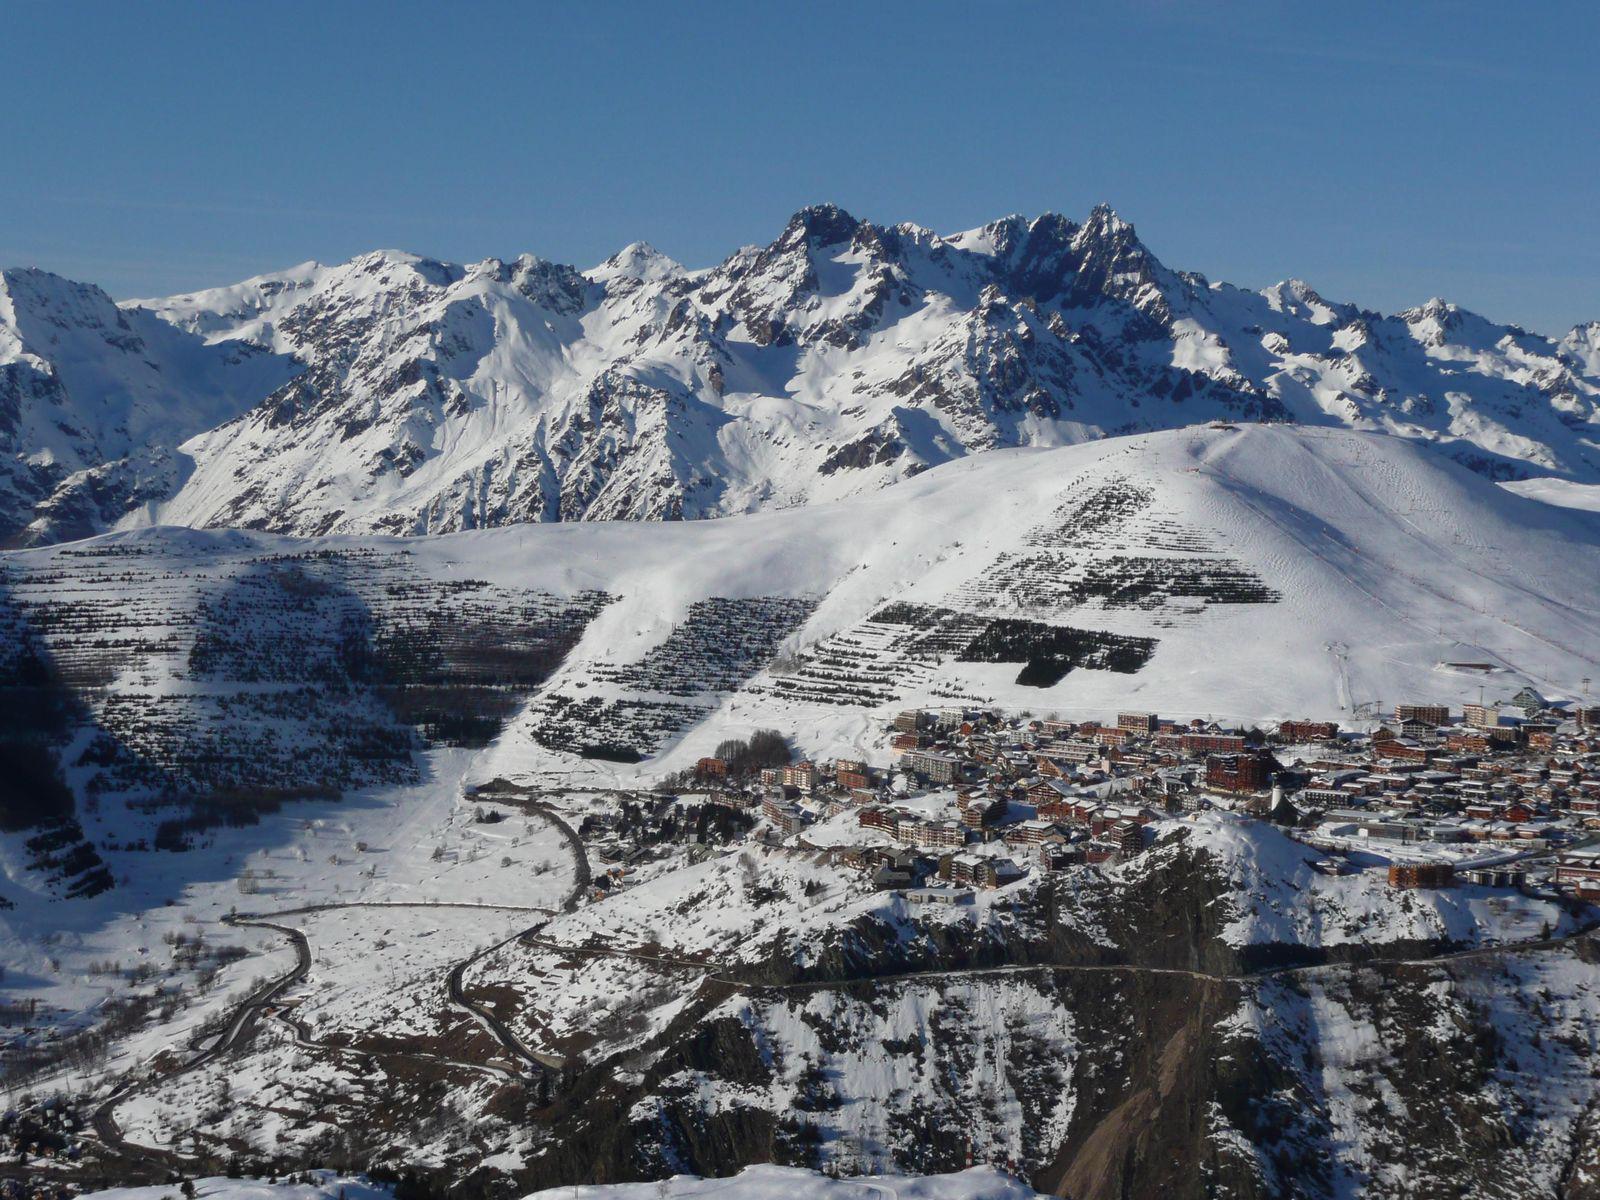 Station de ski d'Alpe d'Huez_Huez